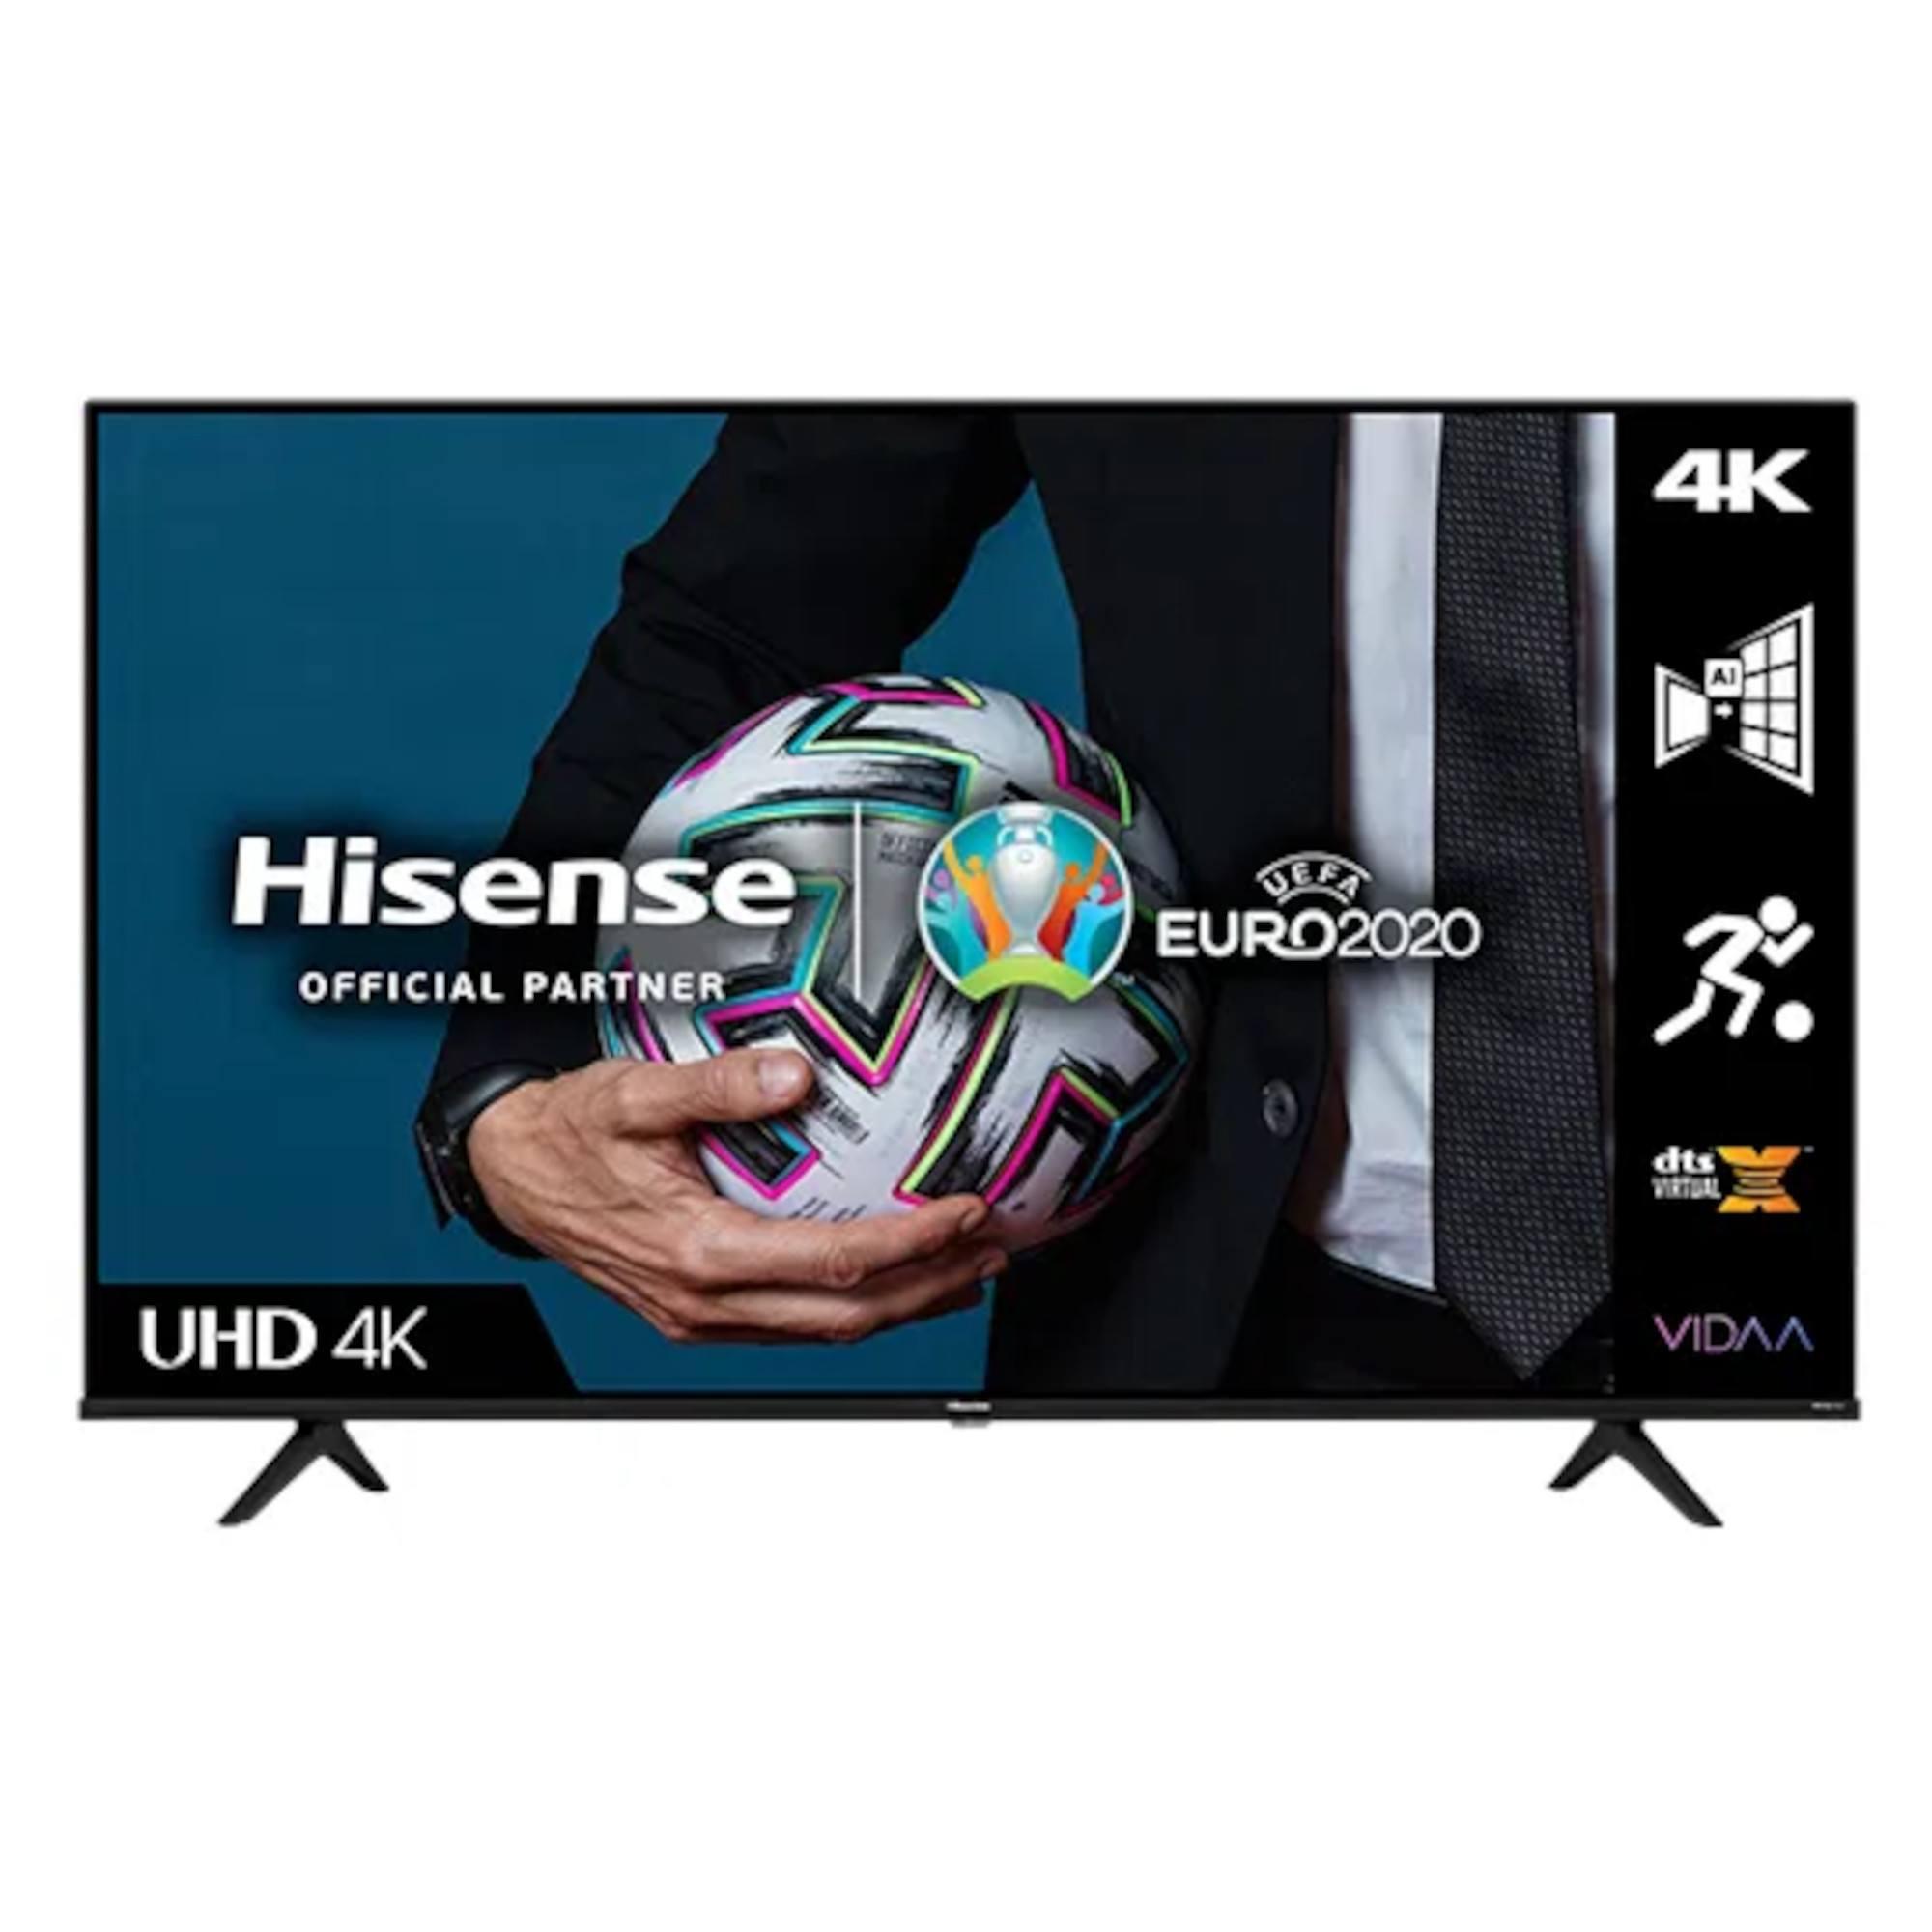 Hisense A6G Series H43A6GTUK 43 HDR 4K Ultra HD DLED TV